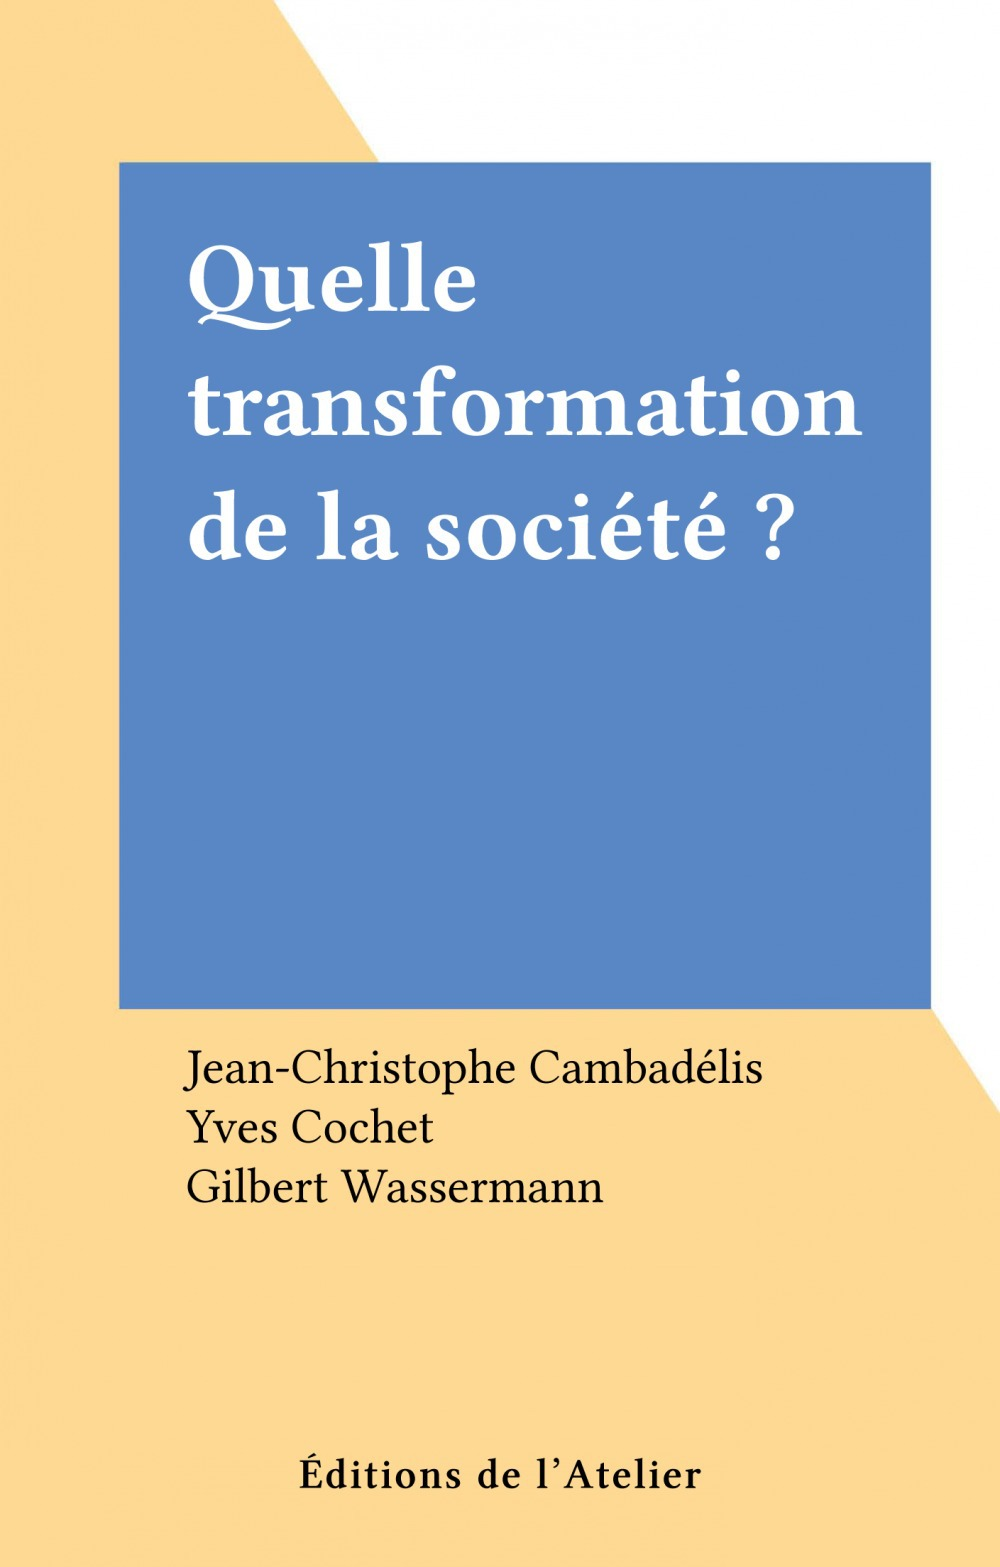 Quelle transformation de la societe ?